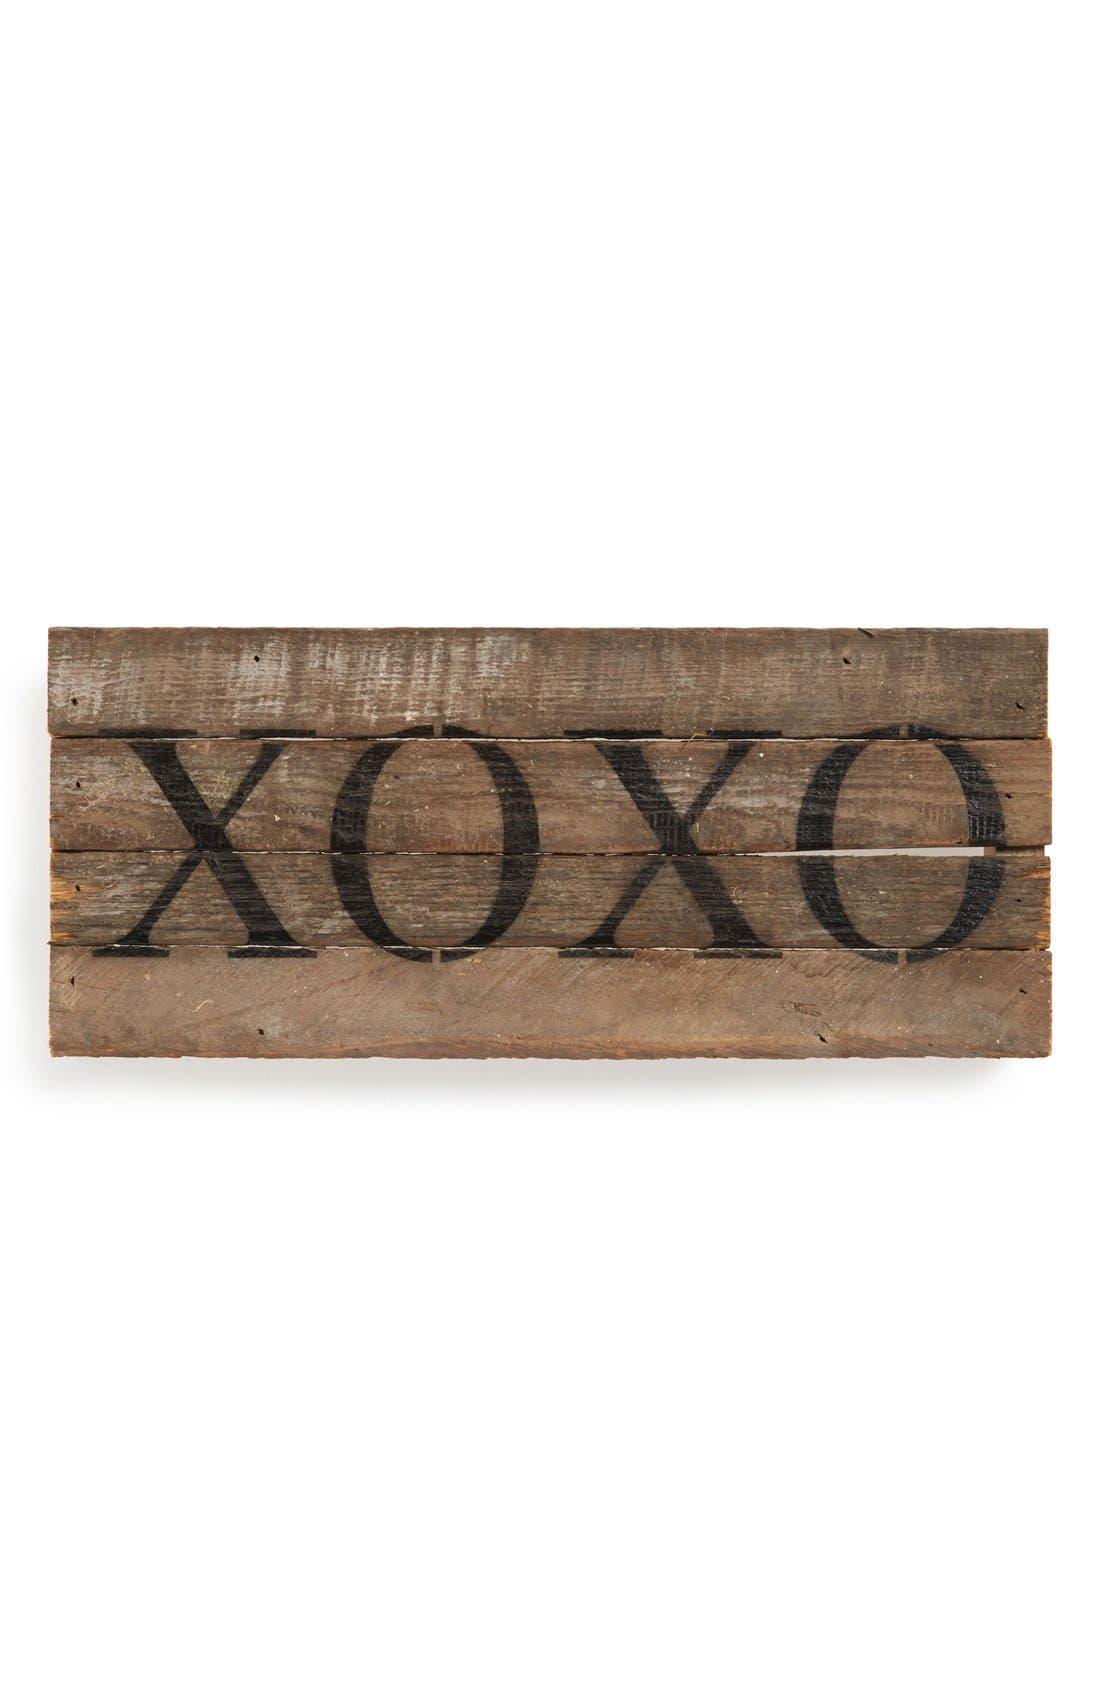 Main Image - Second Nature by Hand 'XOXO' Repurposed Wood Wall Art